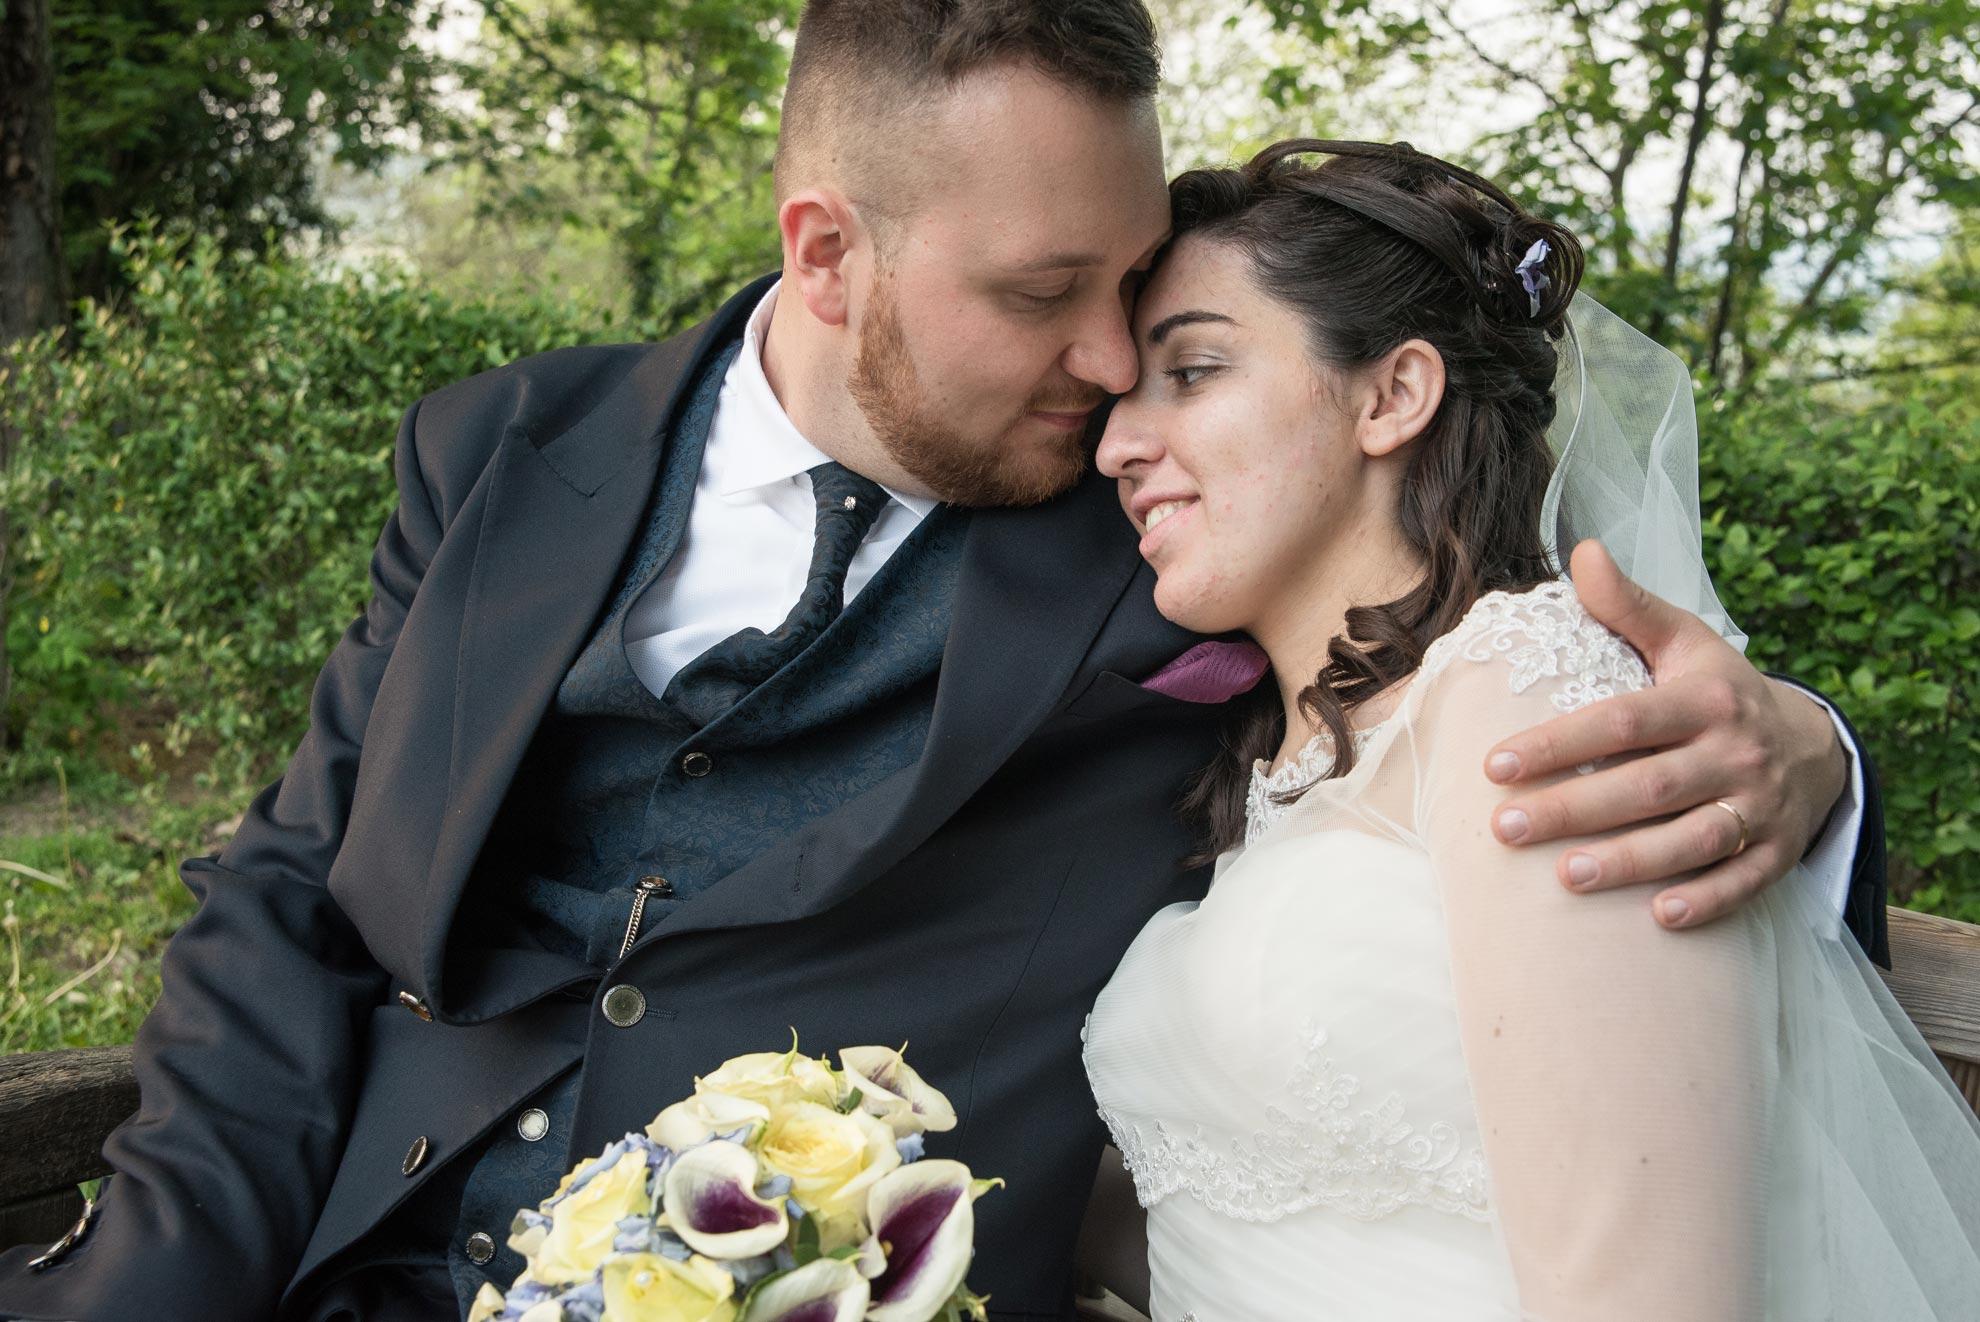 Matrimonio a Narzole Lorenza Diego - DSC 3339 - Fotografo matrimonio Piemonte - Fotografo matrimonio Piemonte